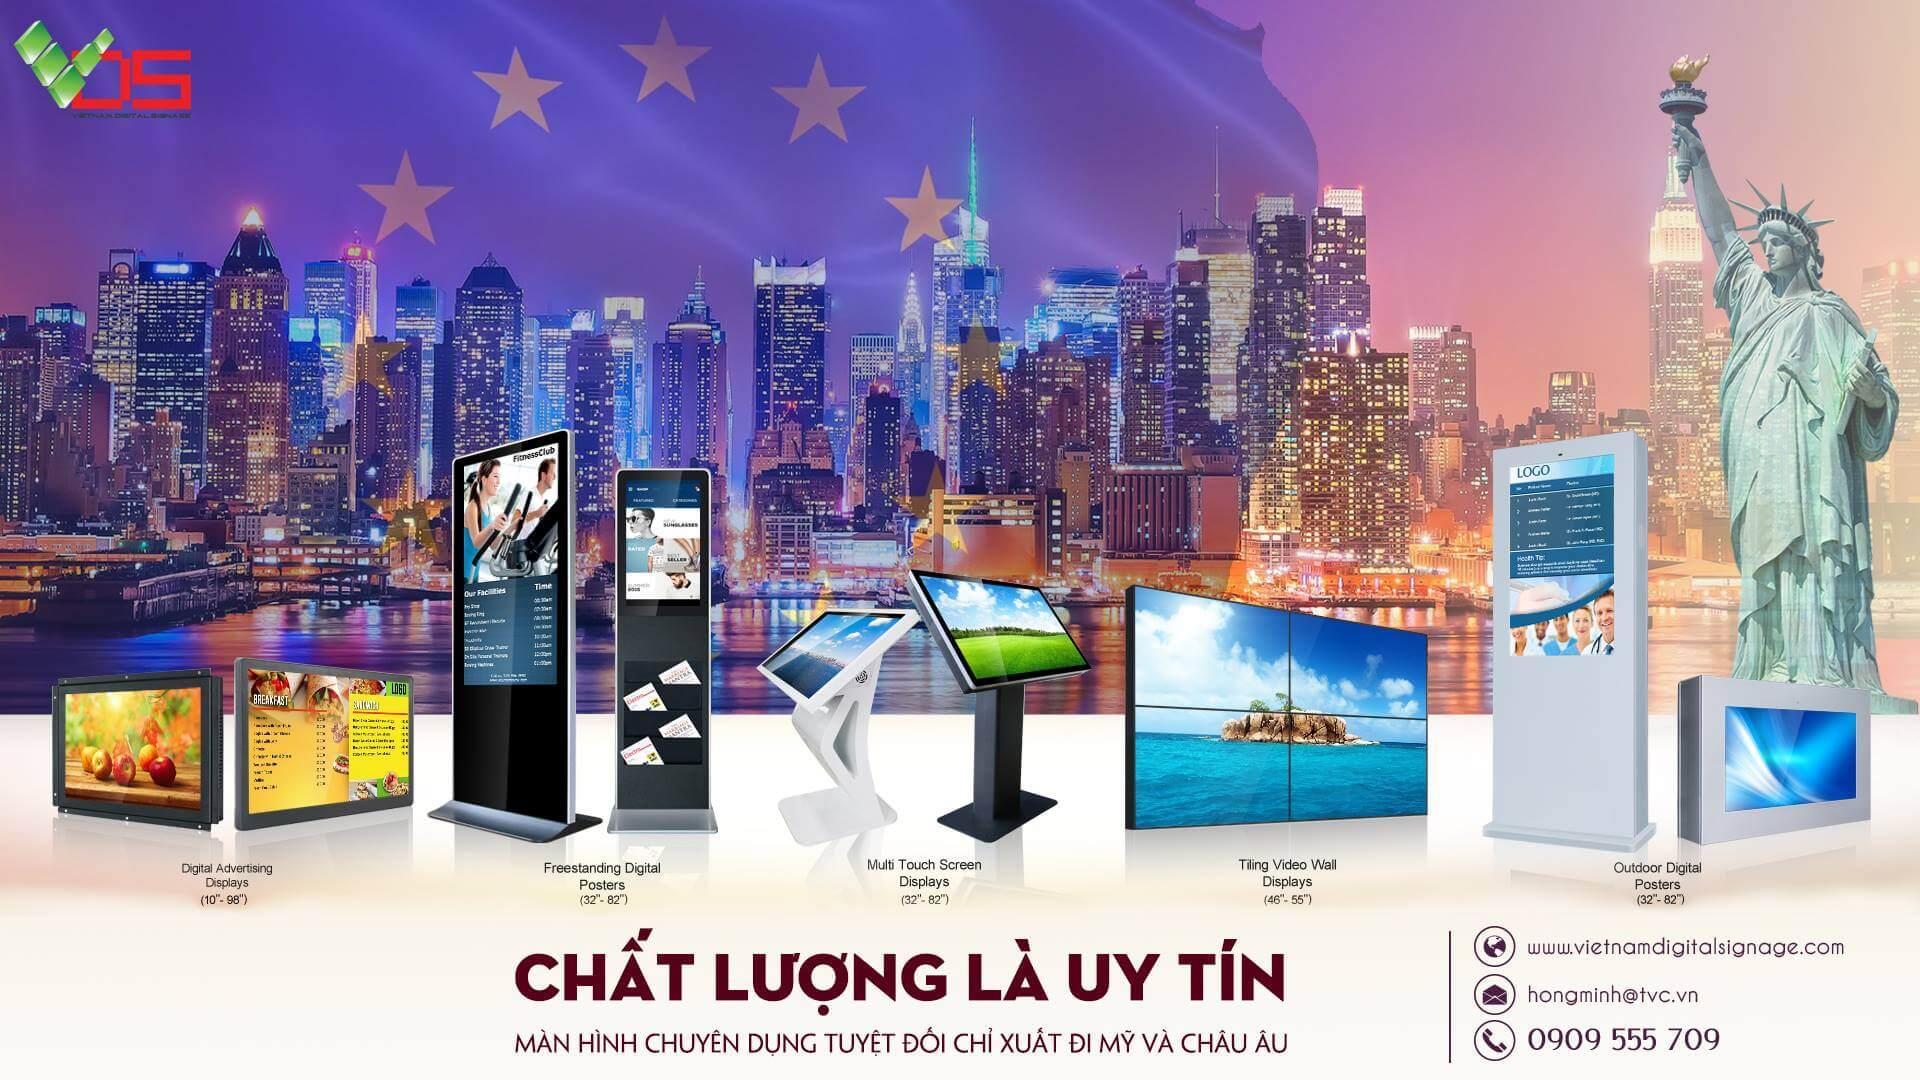 [TVC-VDS] Hang xuat Chau Au - Chat luong la uy tin